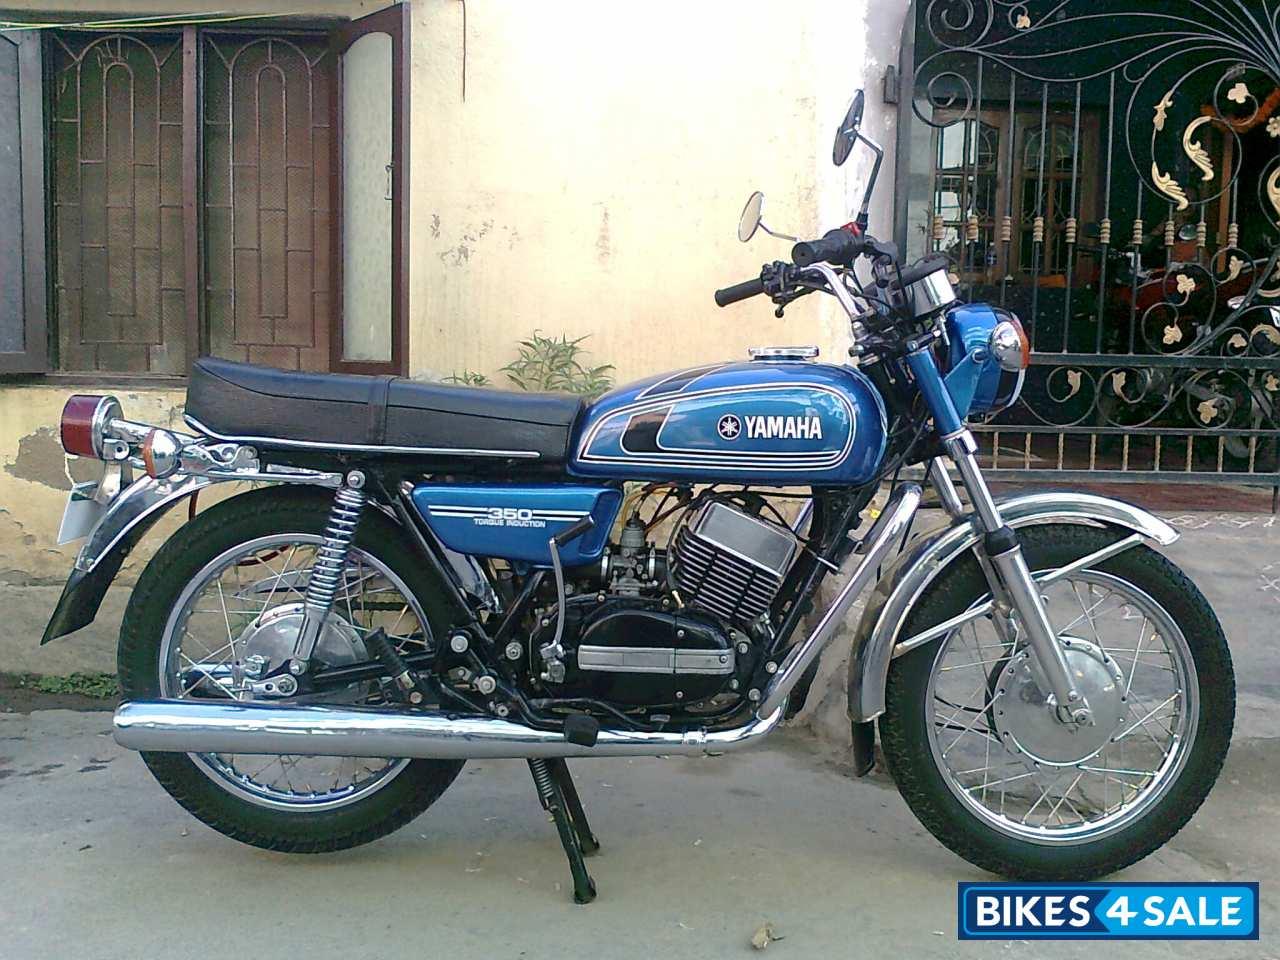 blue yamaha rd 350 picture 3 bike id 69431 bike located in bangalore bikes4sale. Black Bedroom Furniture Sets. Home Design Ideas